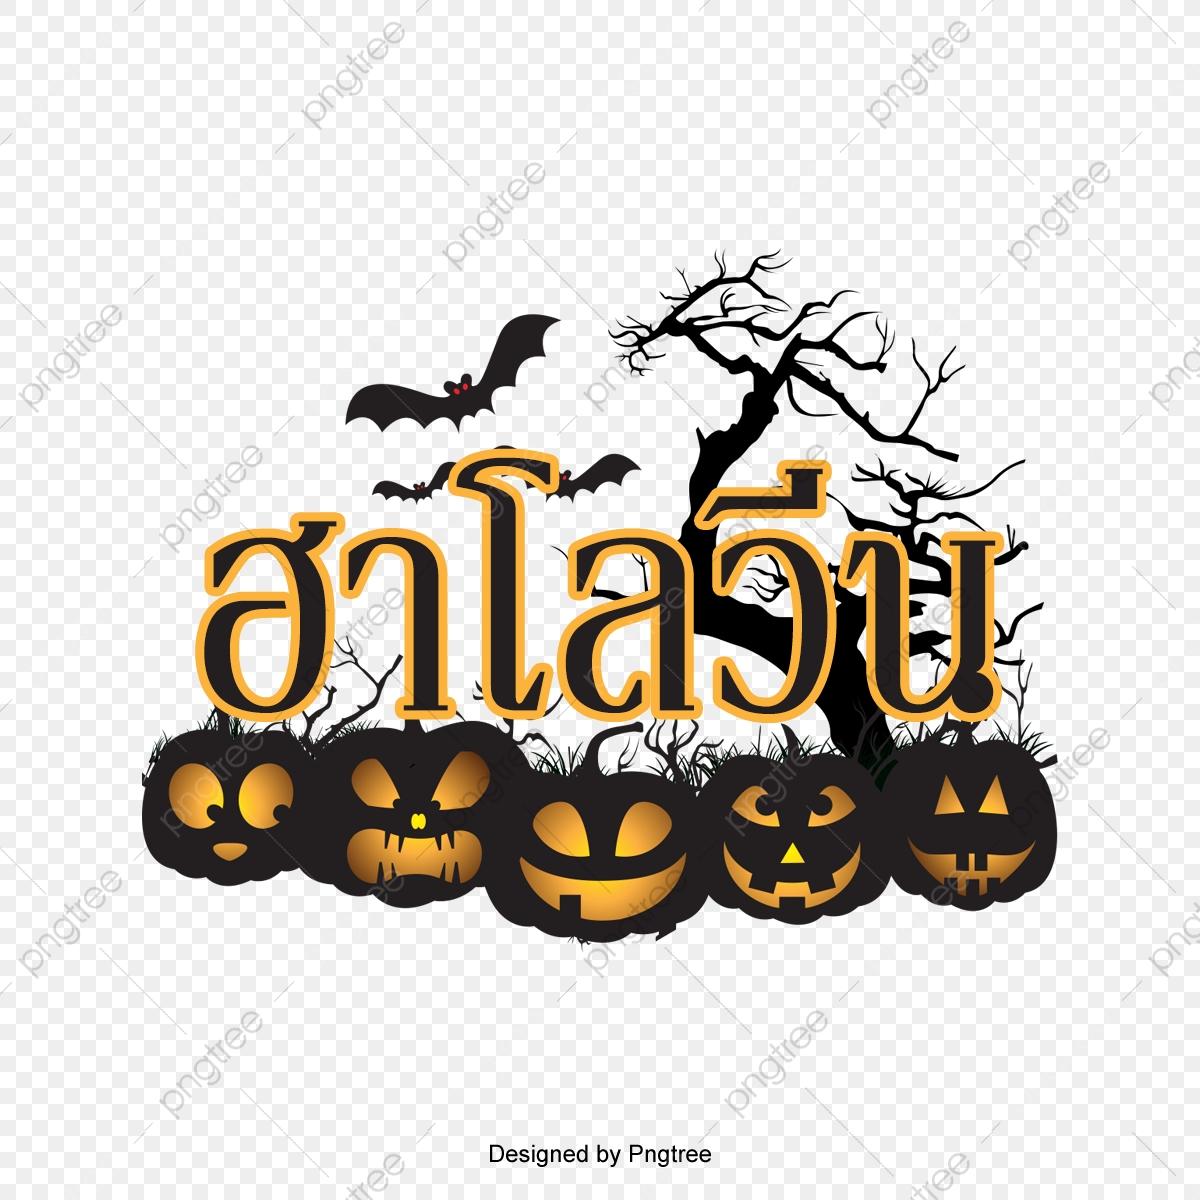 Halloween Vintage Clipart.Vintage Terrible Halloween Vintage Terrible Halloween Png